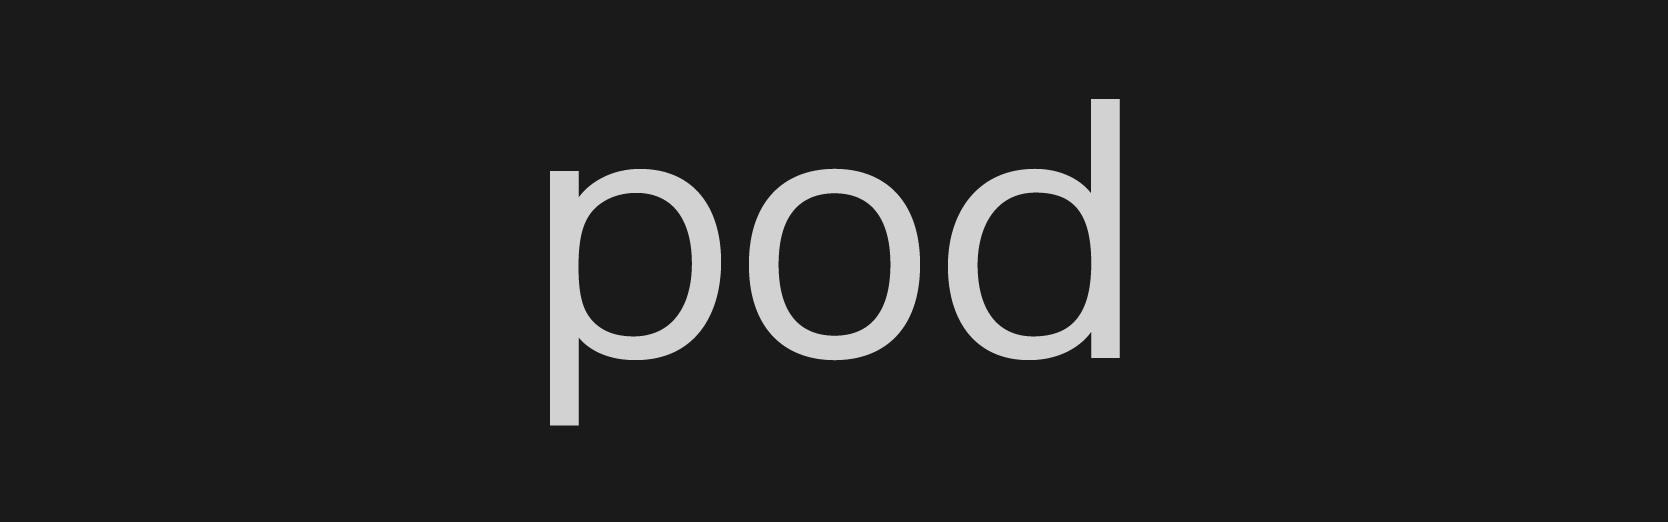 ostreet-pod-06